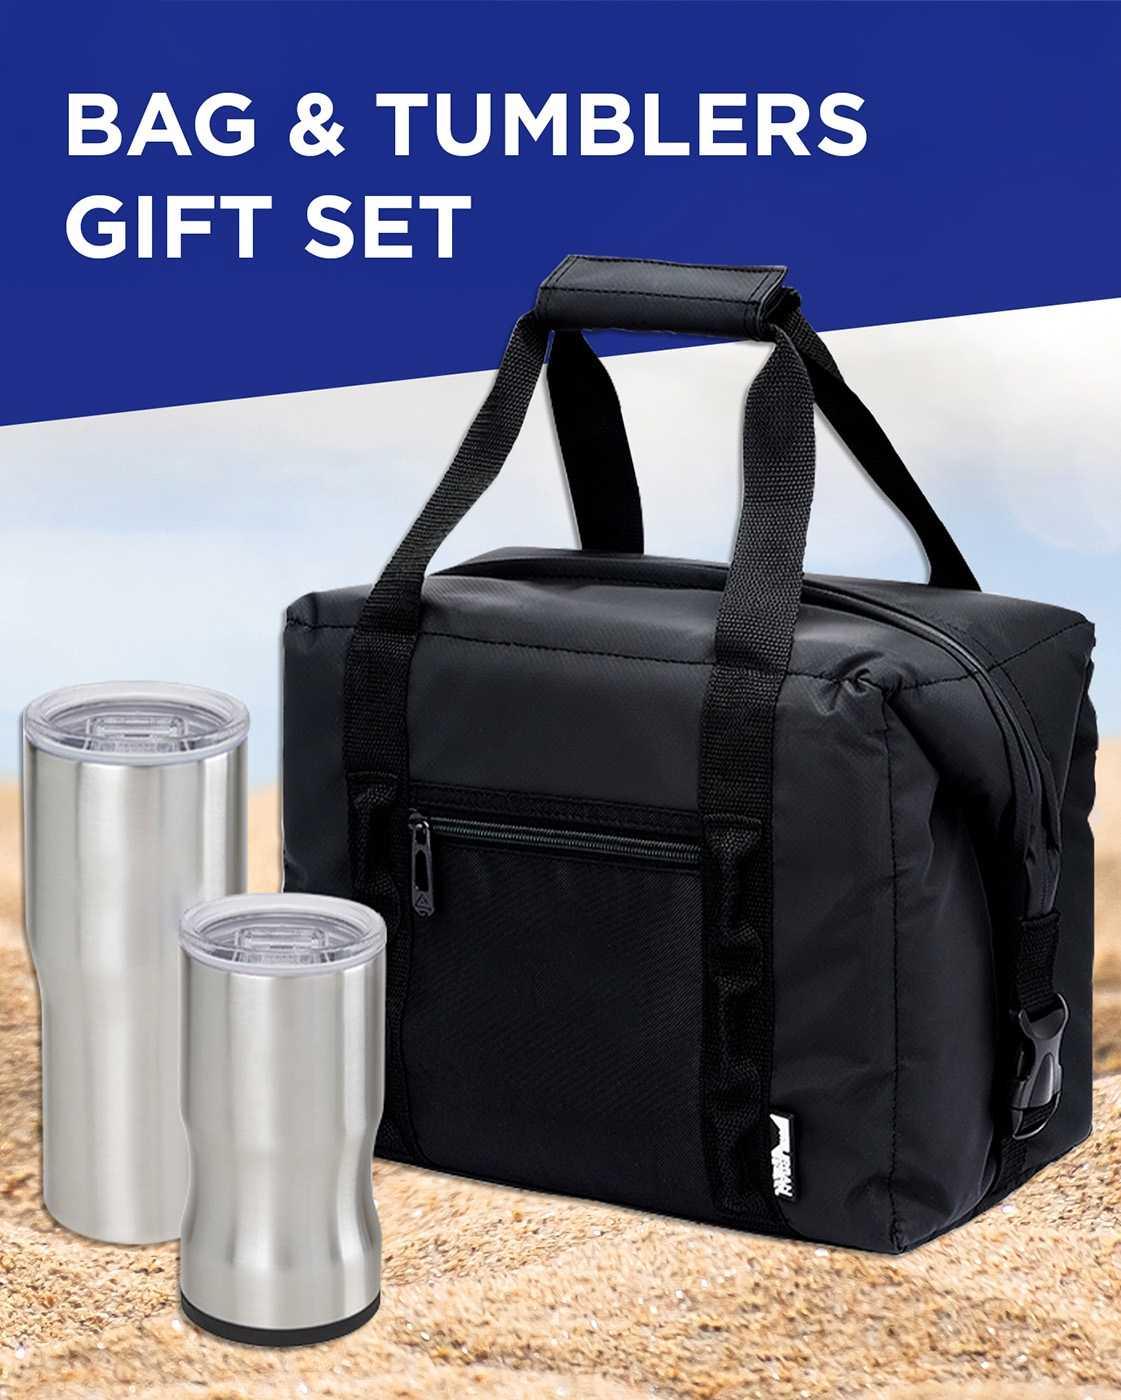 Bags and Tumblers Gift Set AIM